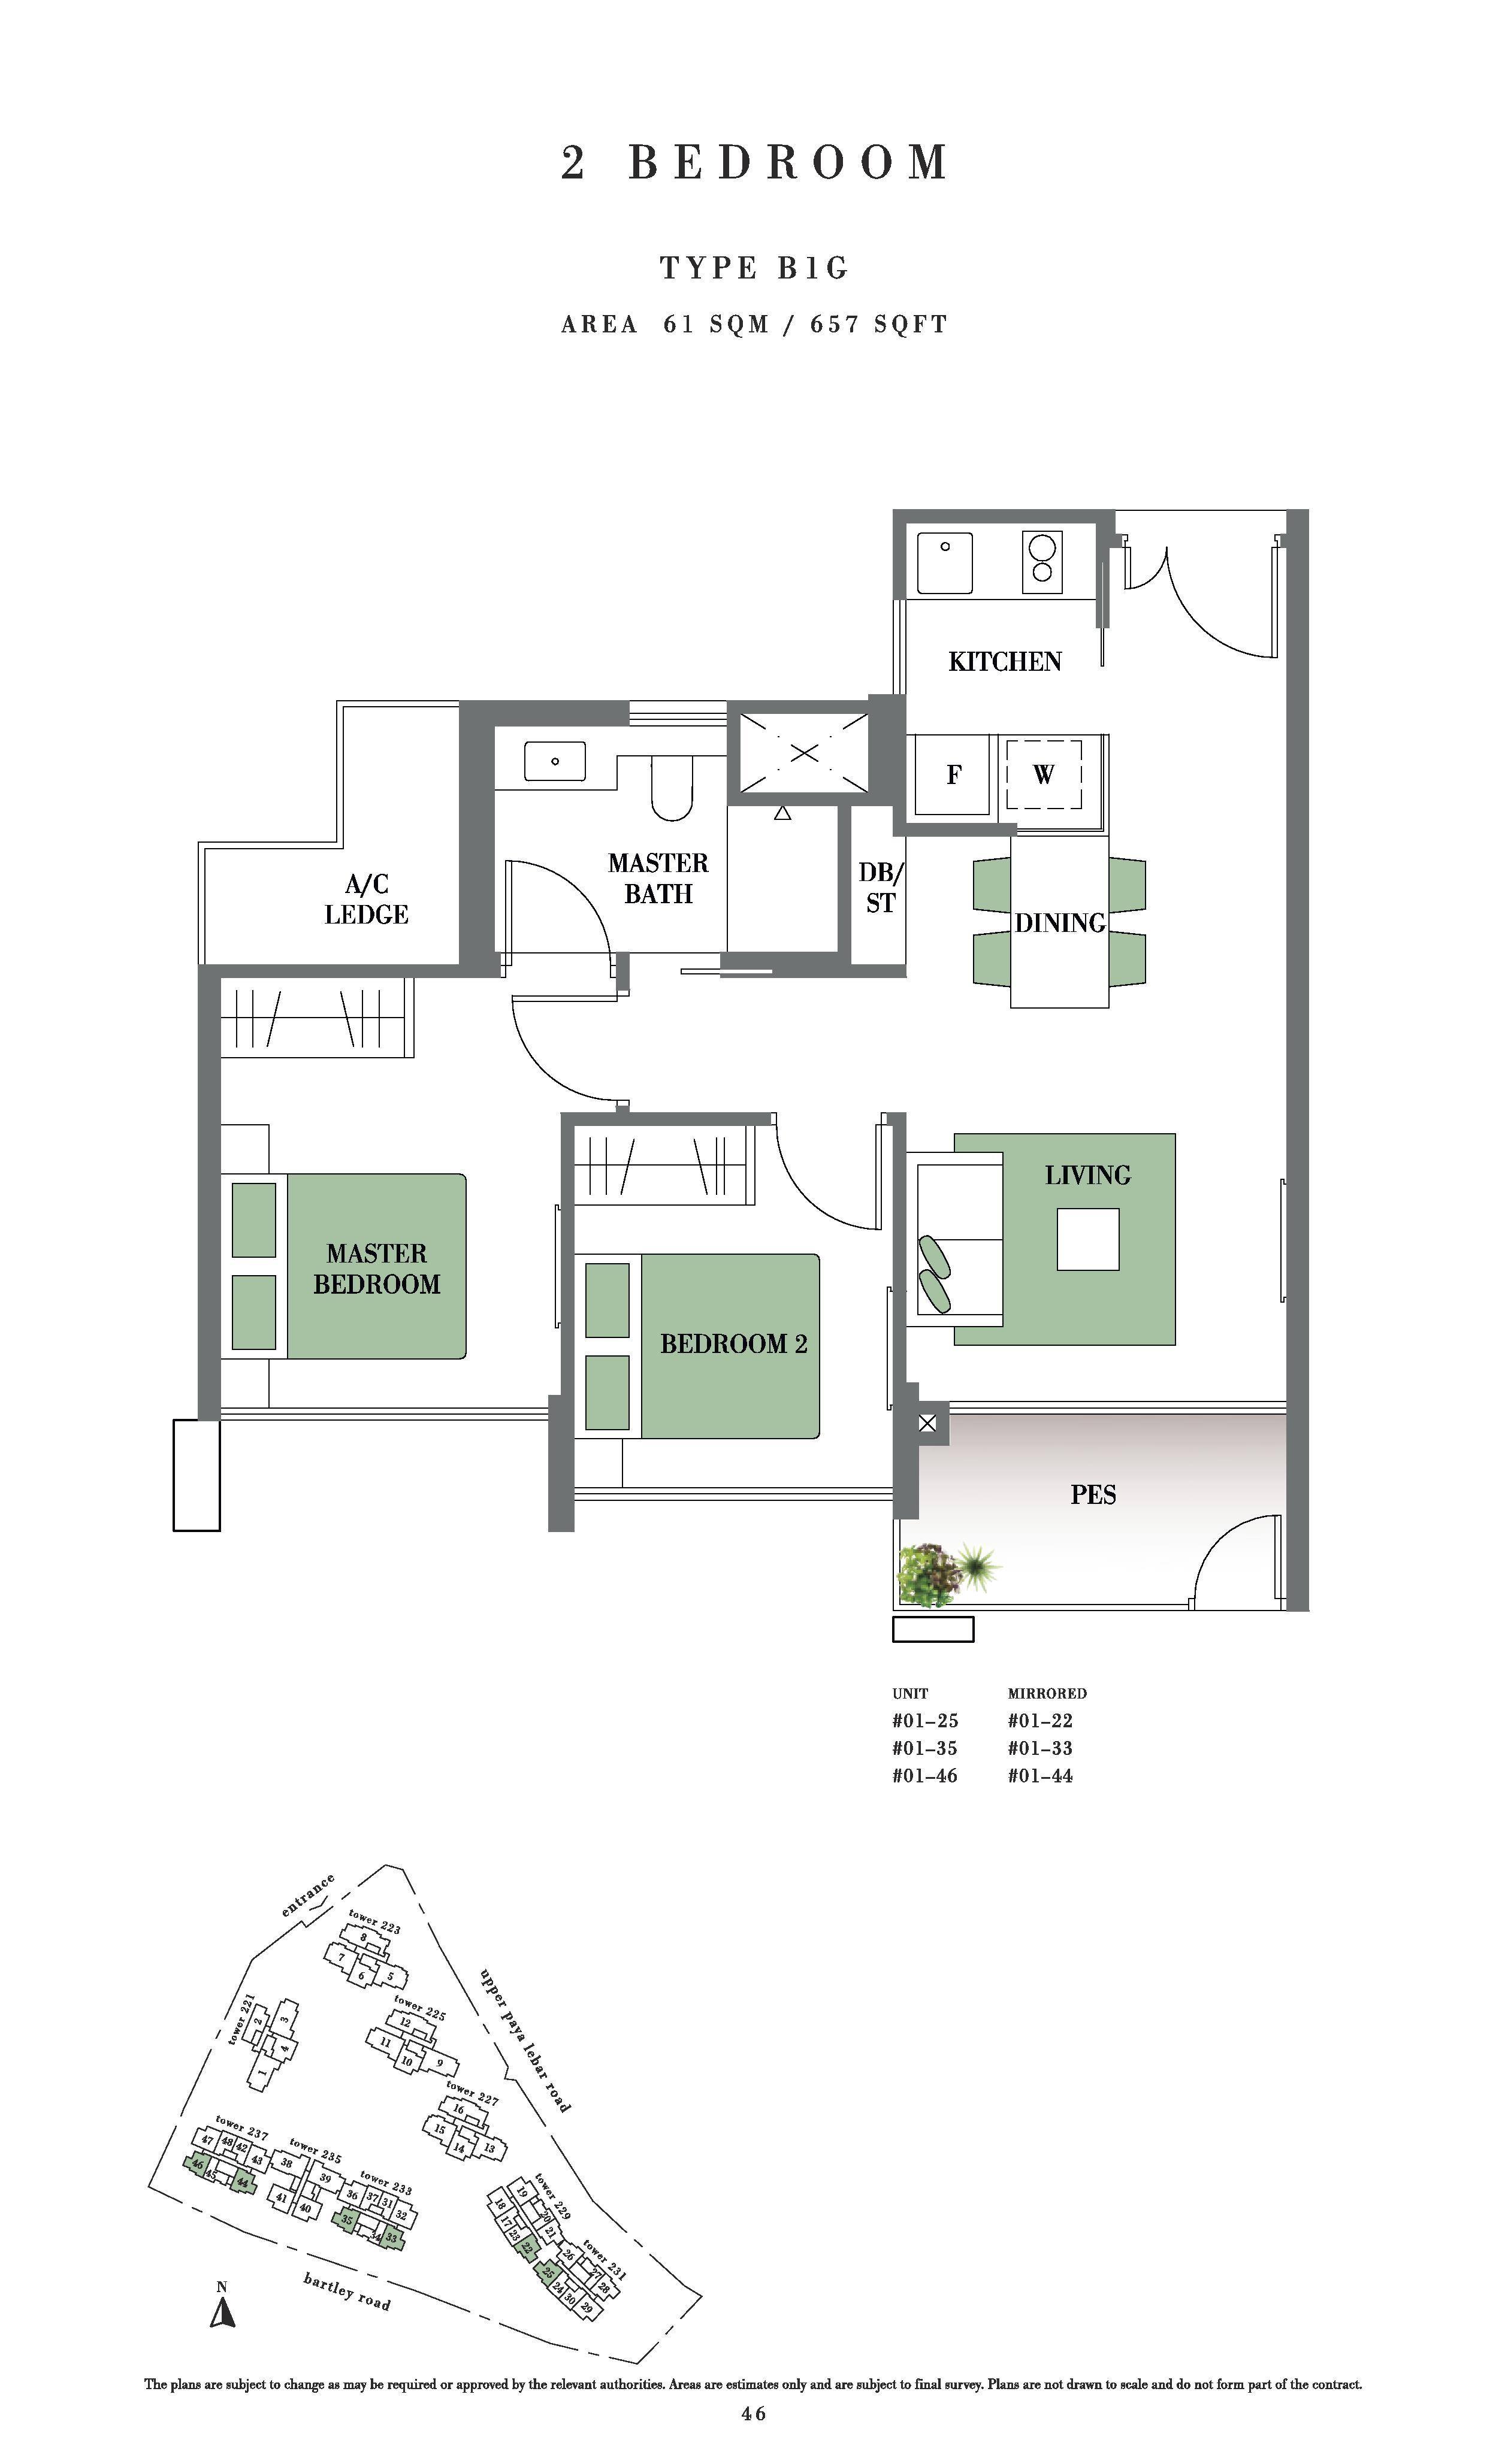 Botanique @ Bartley 2 Bedroom PES Floor Plans Type B1G